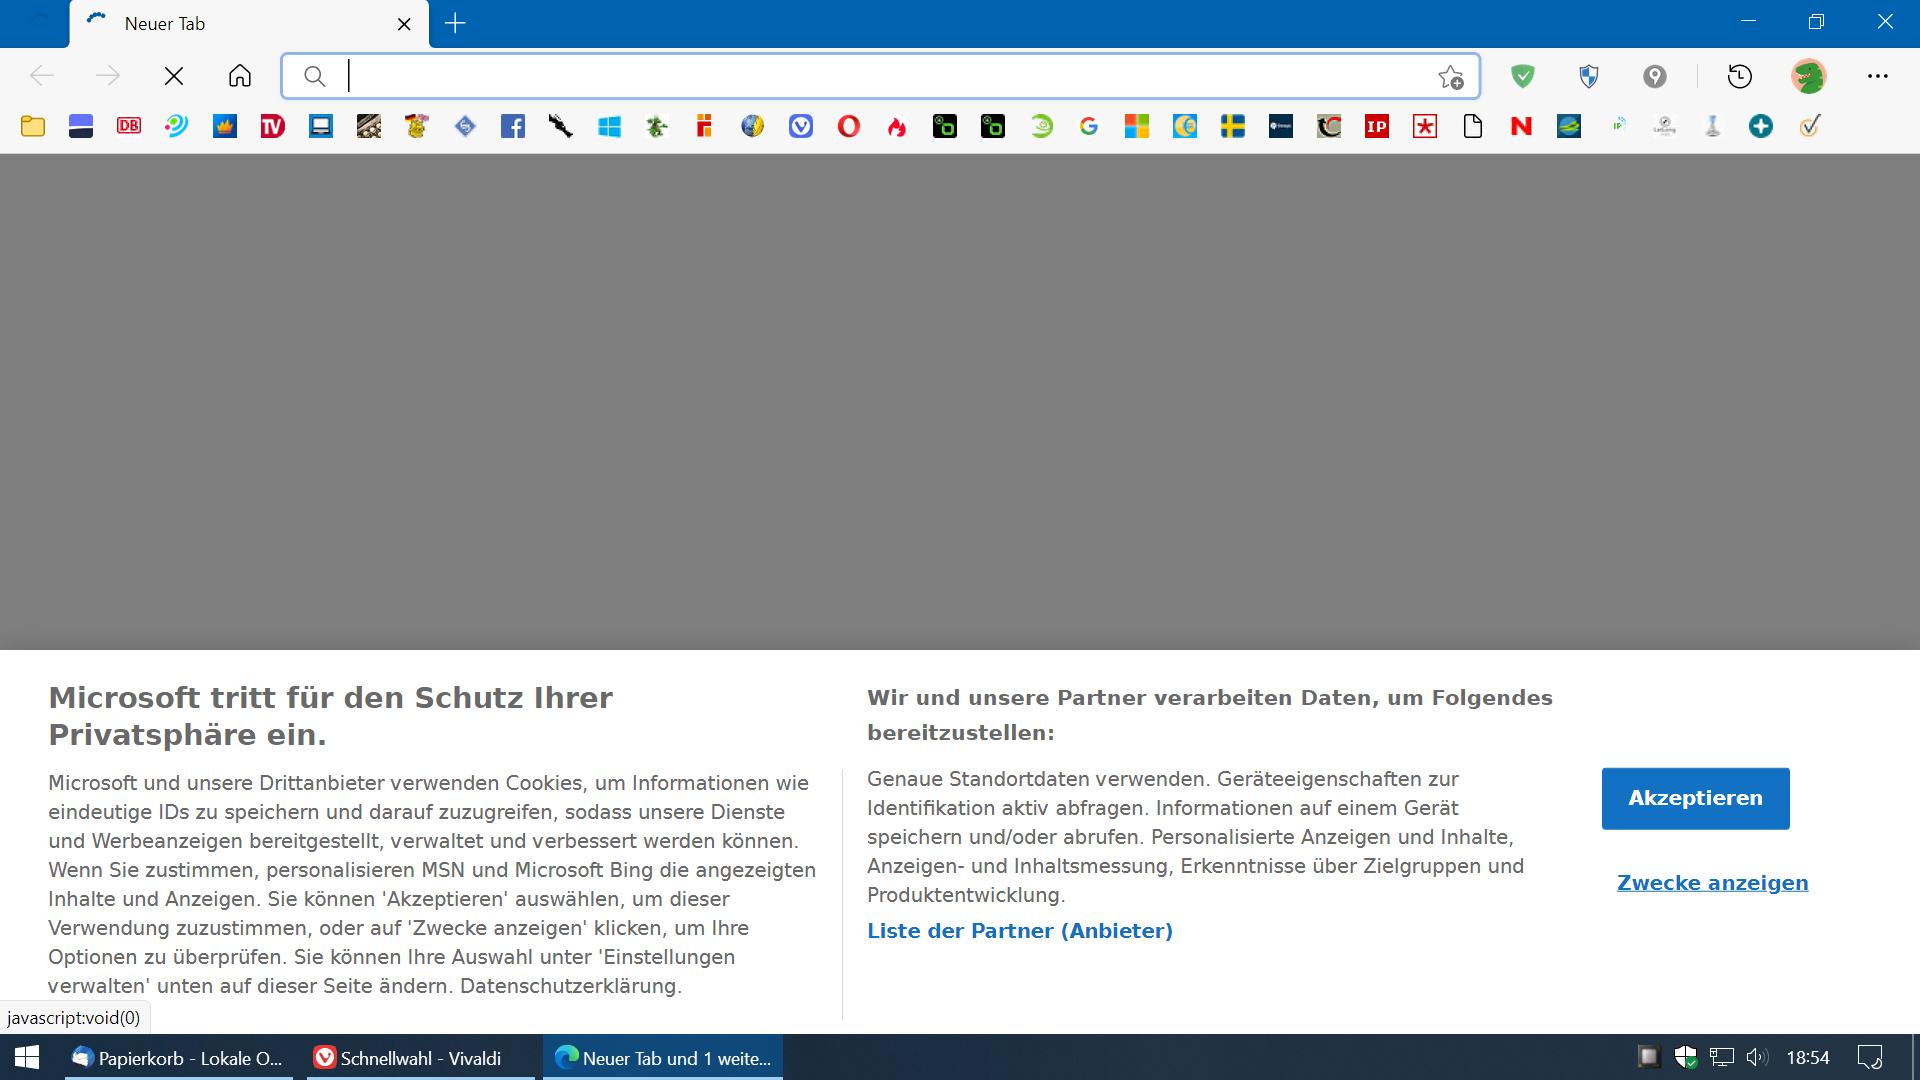 Edge_Datenschutz_Akzeptieren_Fenster.png